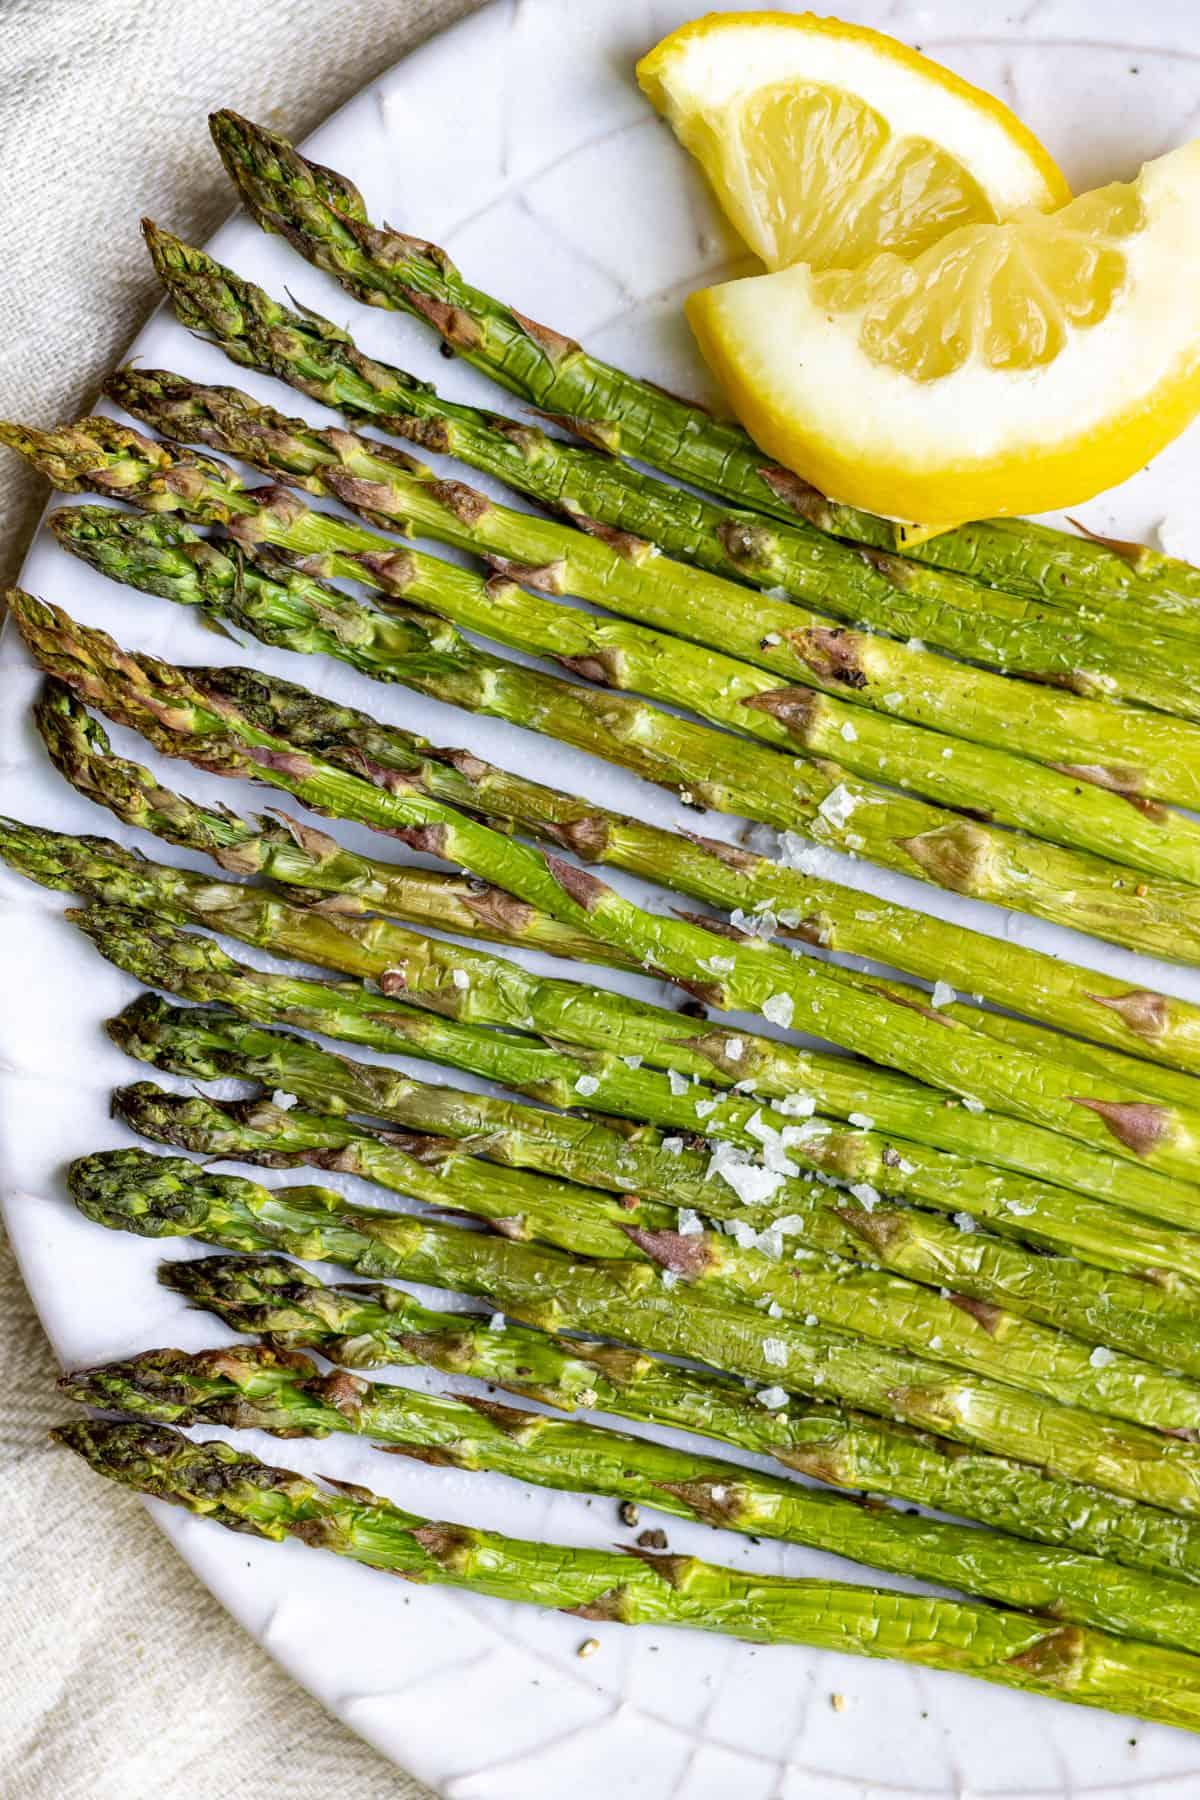 A plate of asparagus with a lemon wedge.